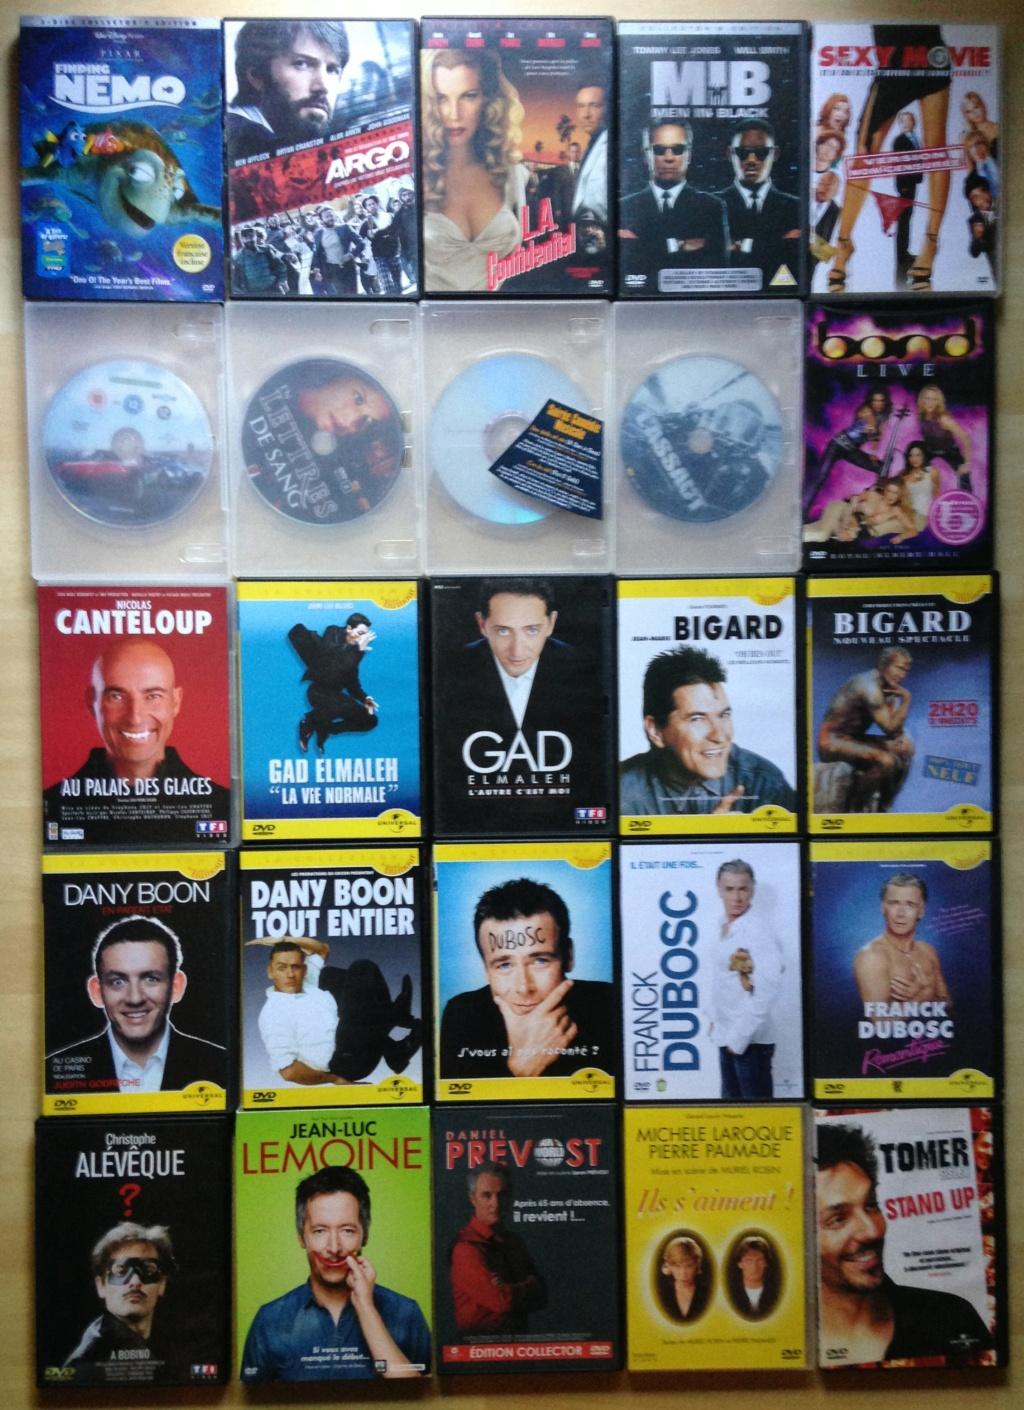 [DON/ECH] Le gros foutoir DVD [MAJ 10/05] - Page 6 Img_0713